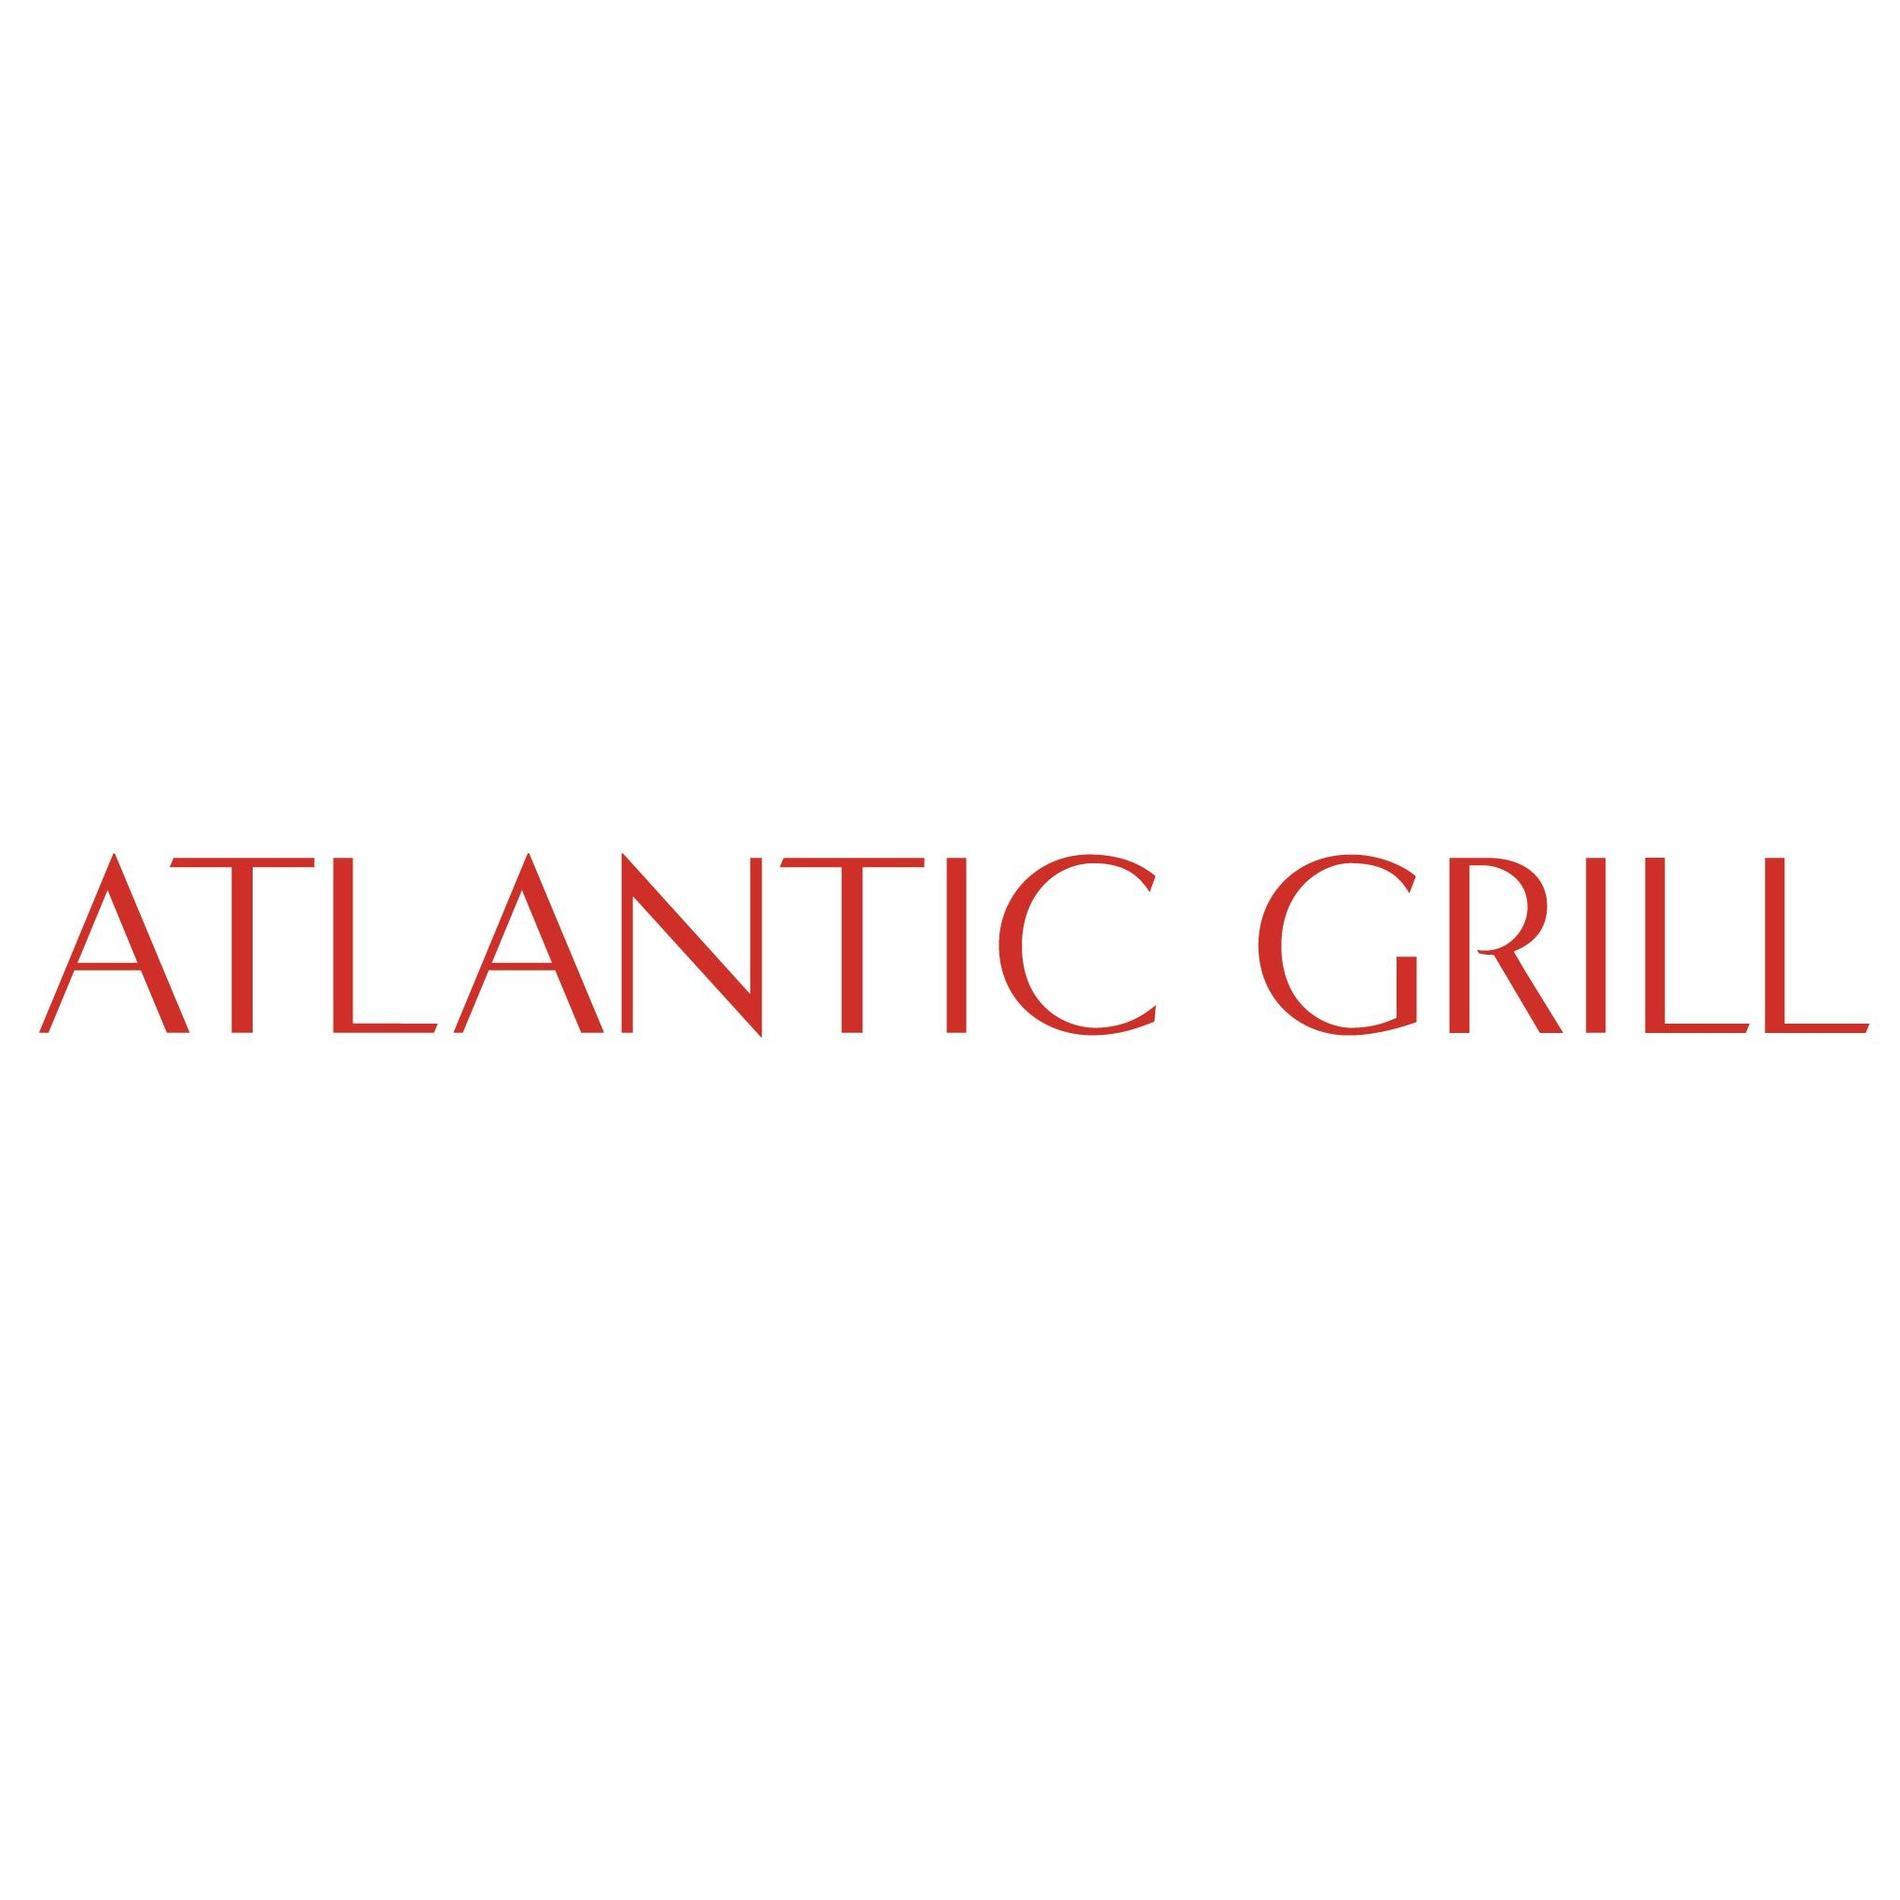 Atlantic Grill image 3